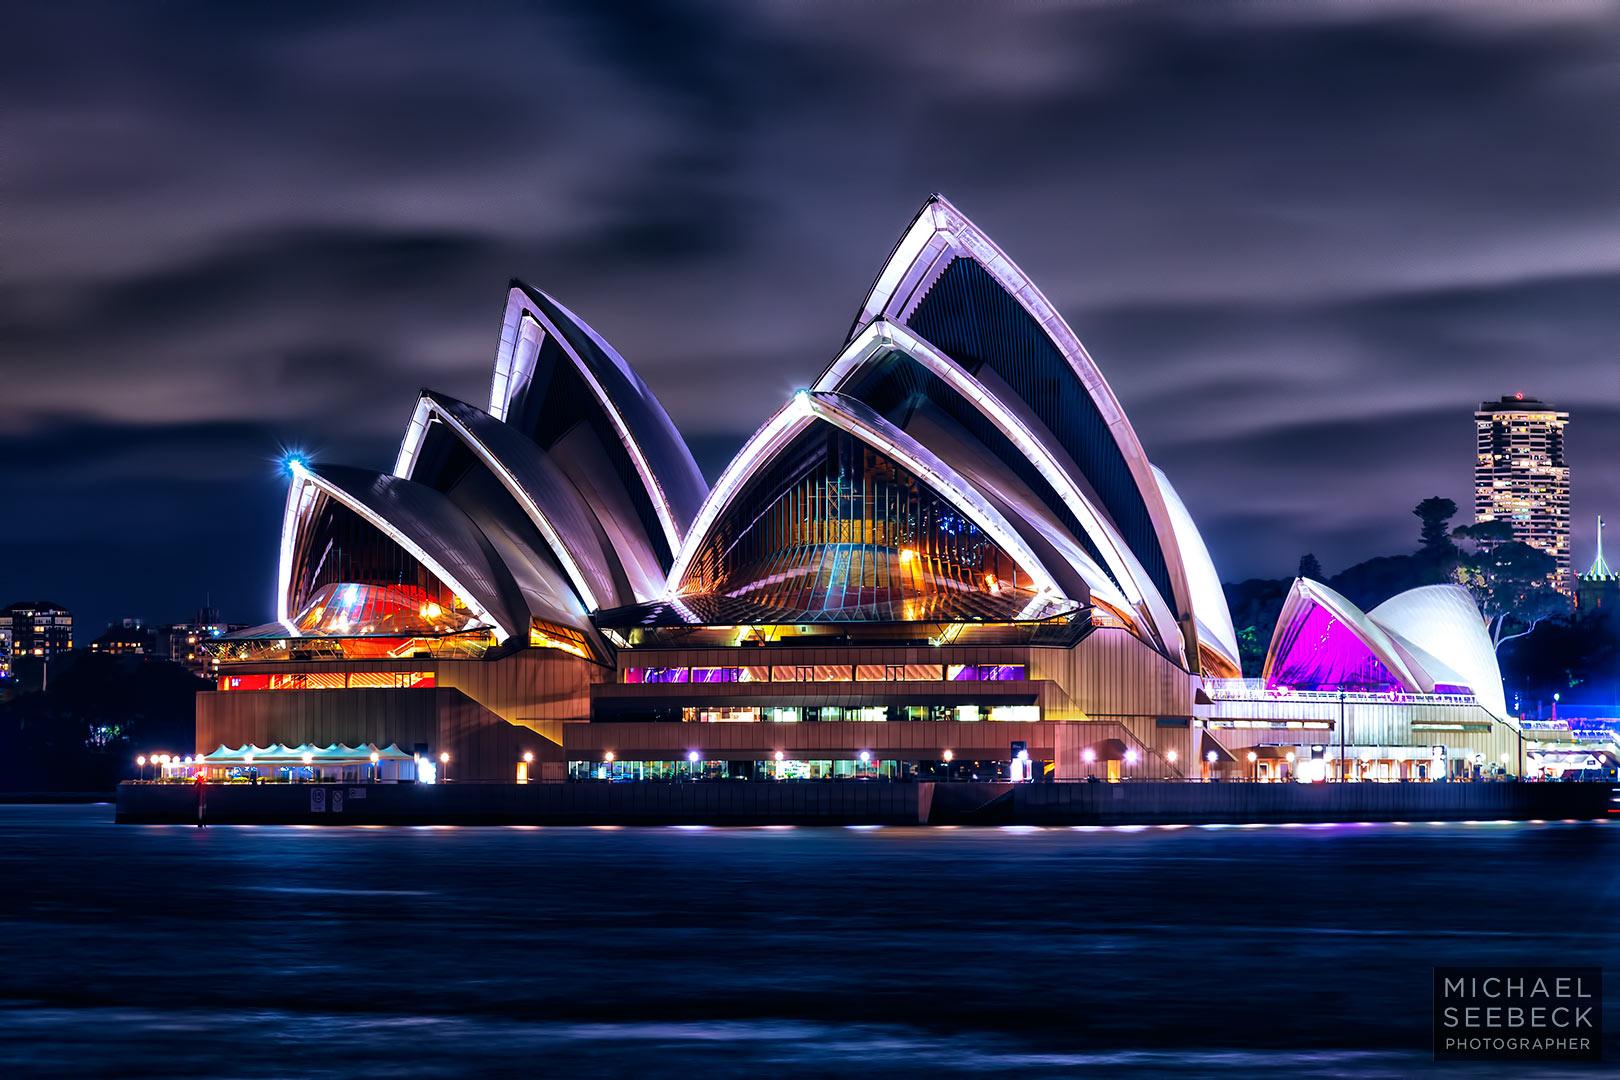 sydney-opera-house-at-night-lanm0006